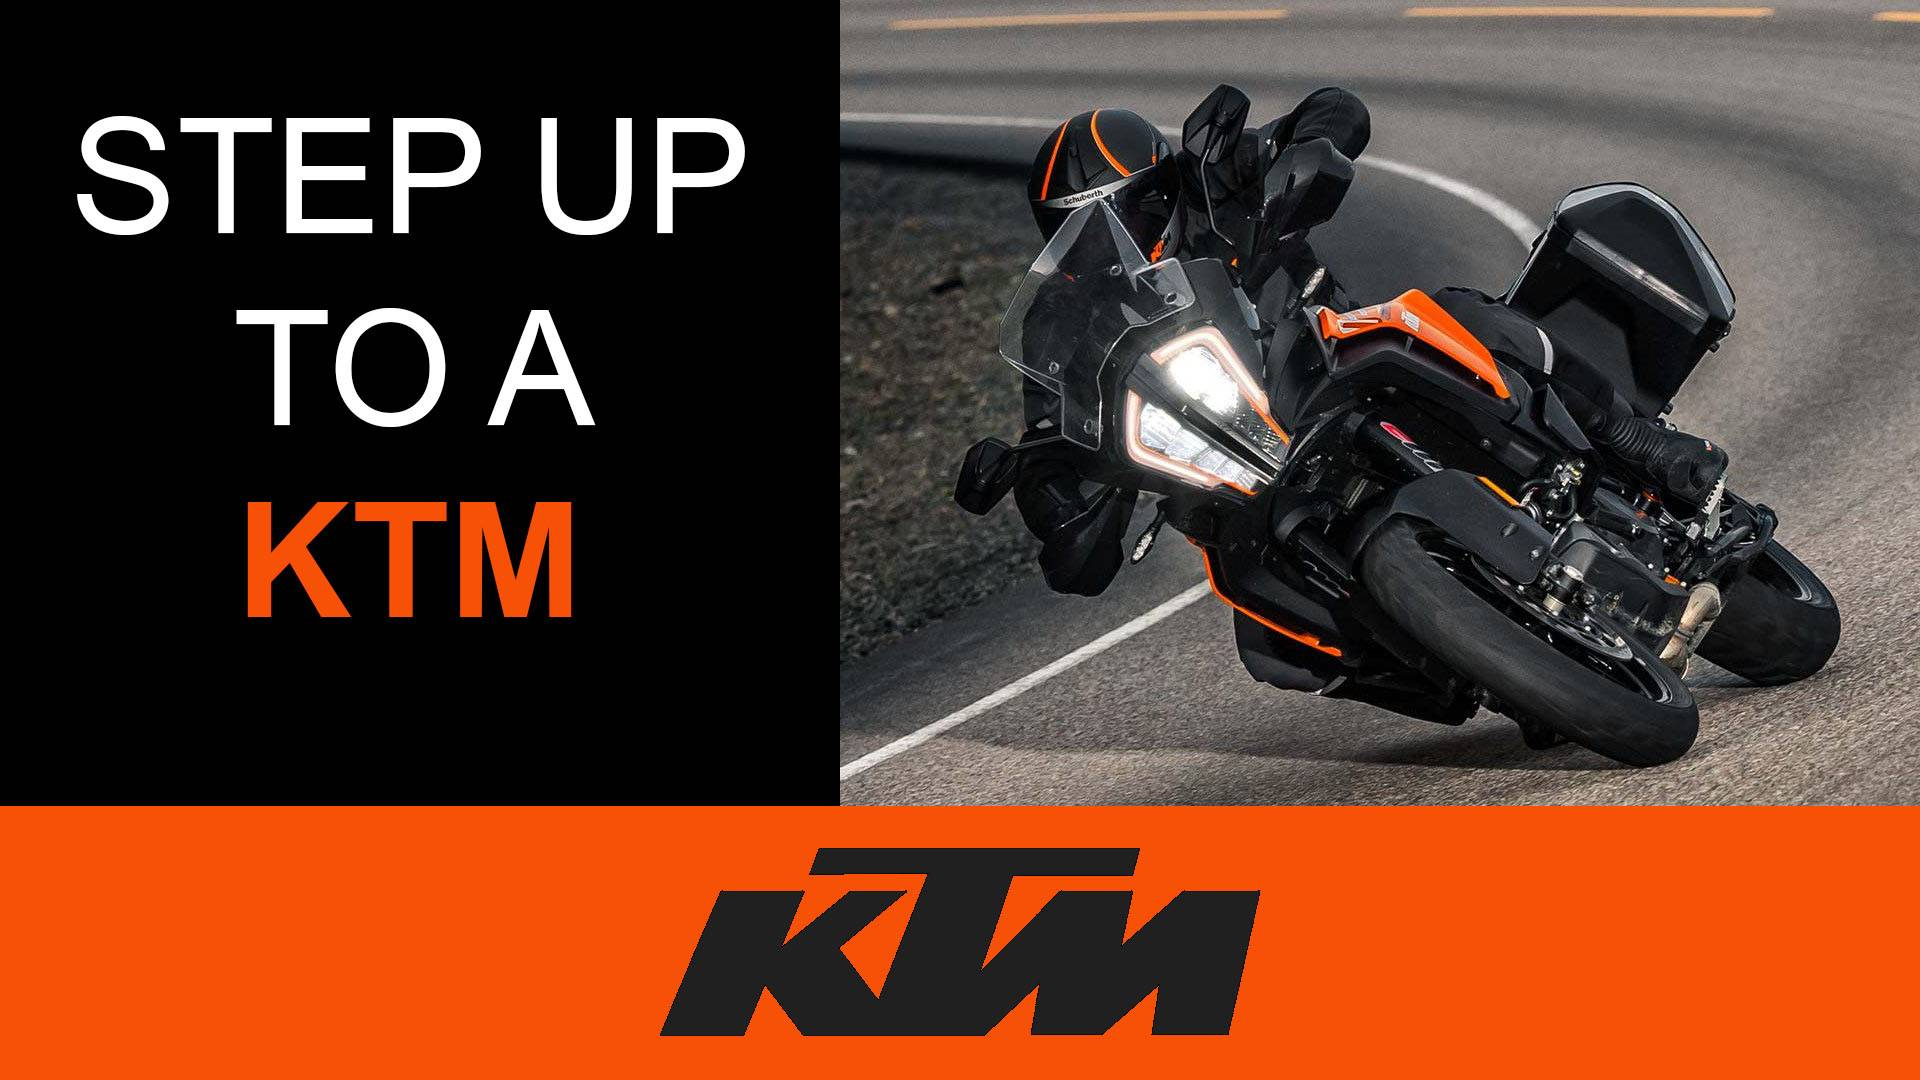 KTM - Step Up To A KTM